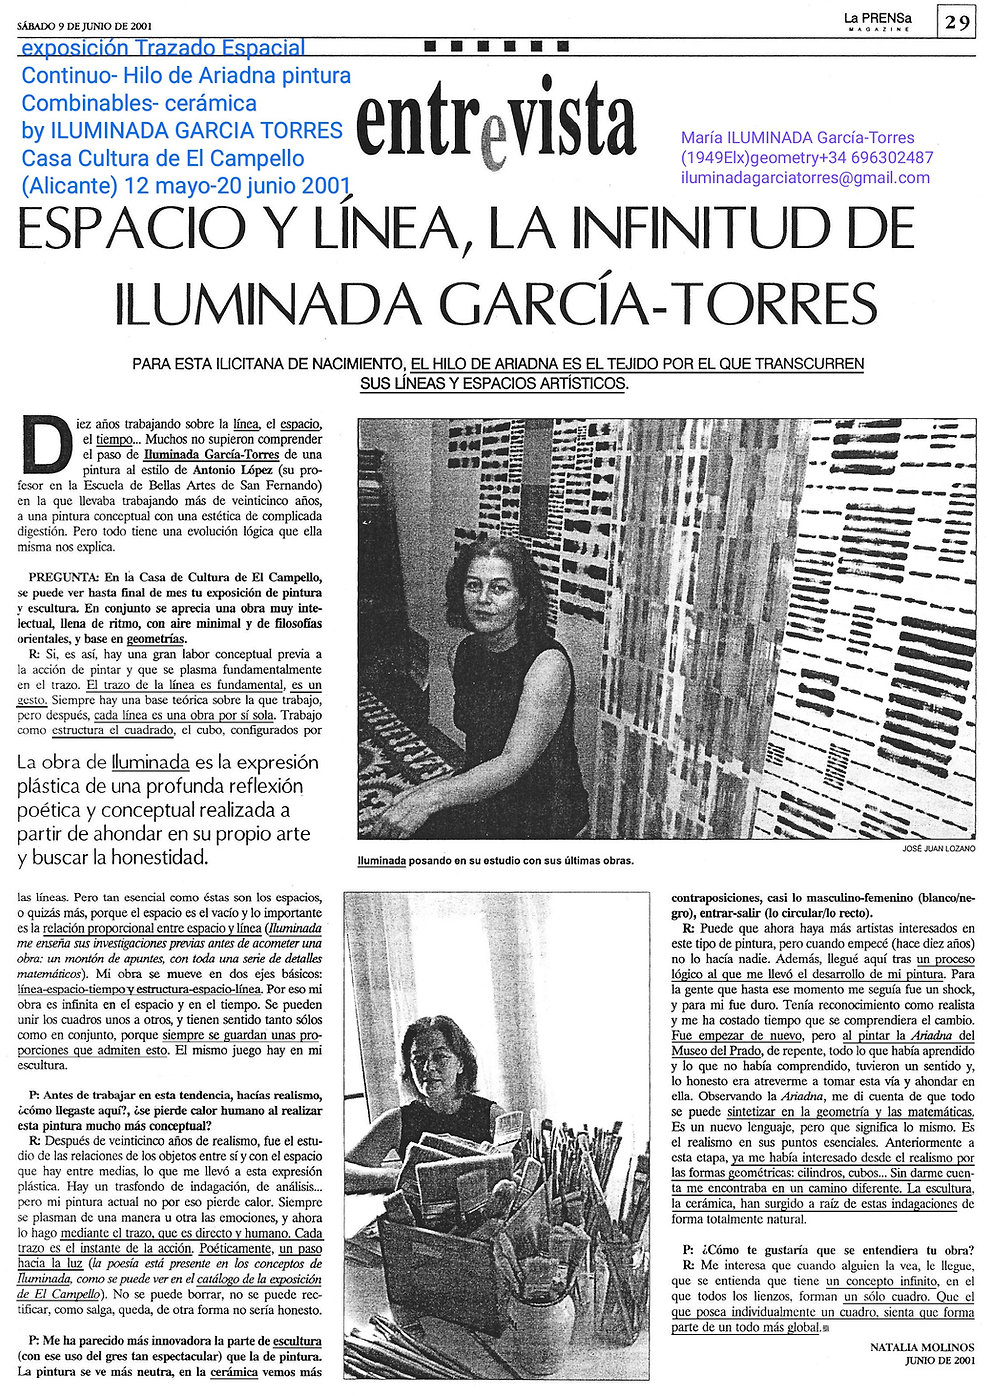 2001texto Natalia Molinos Navarro exposi